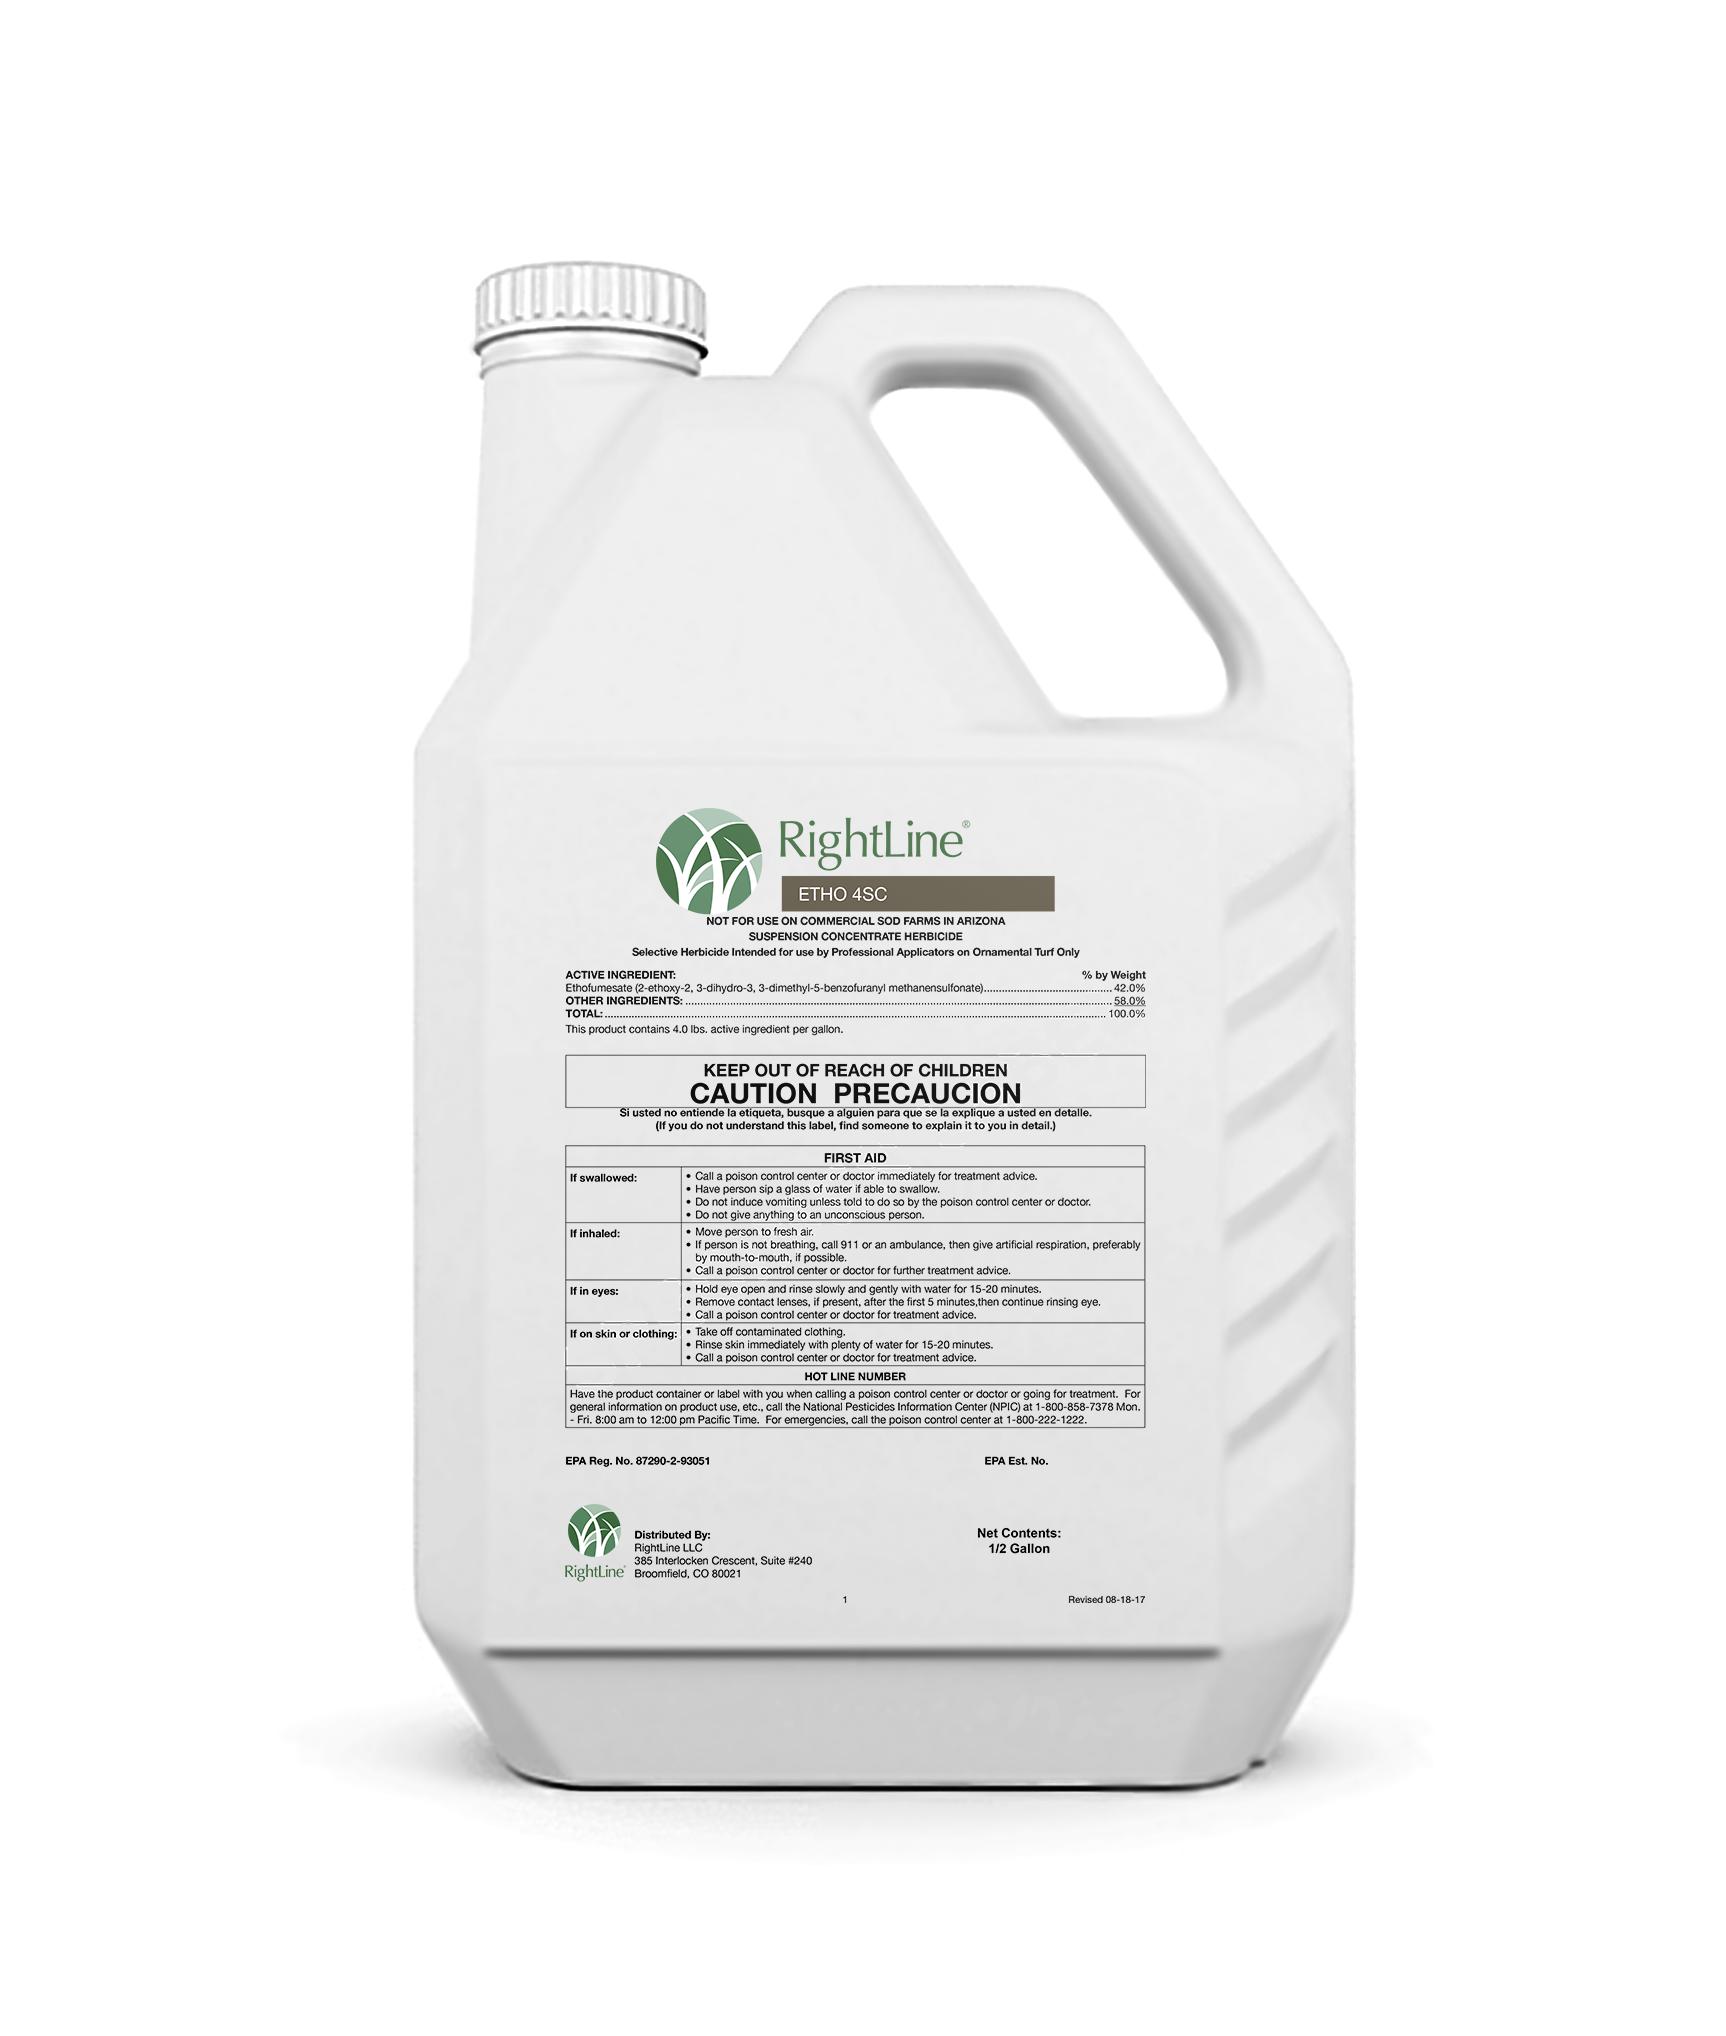 rightline ETHO 4SC herbicide